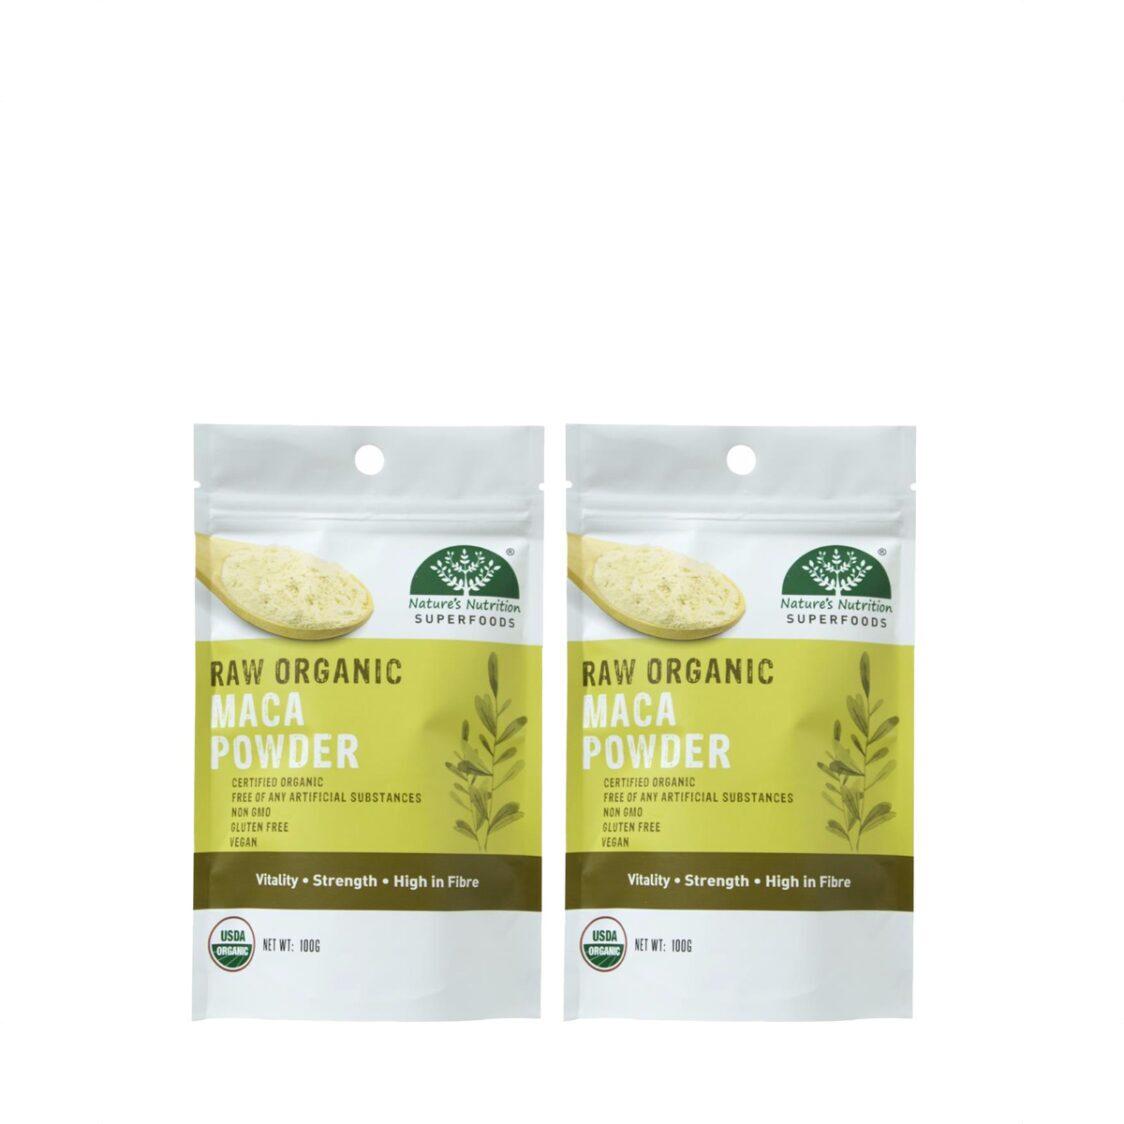 Natures Nutrition Organic Maca Powder 100g Bundle of 2